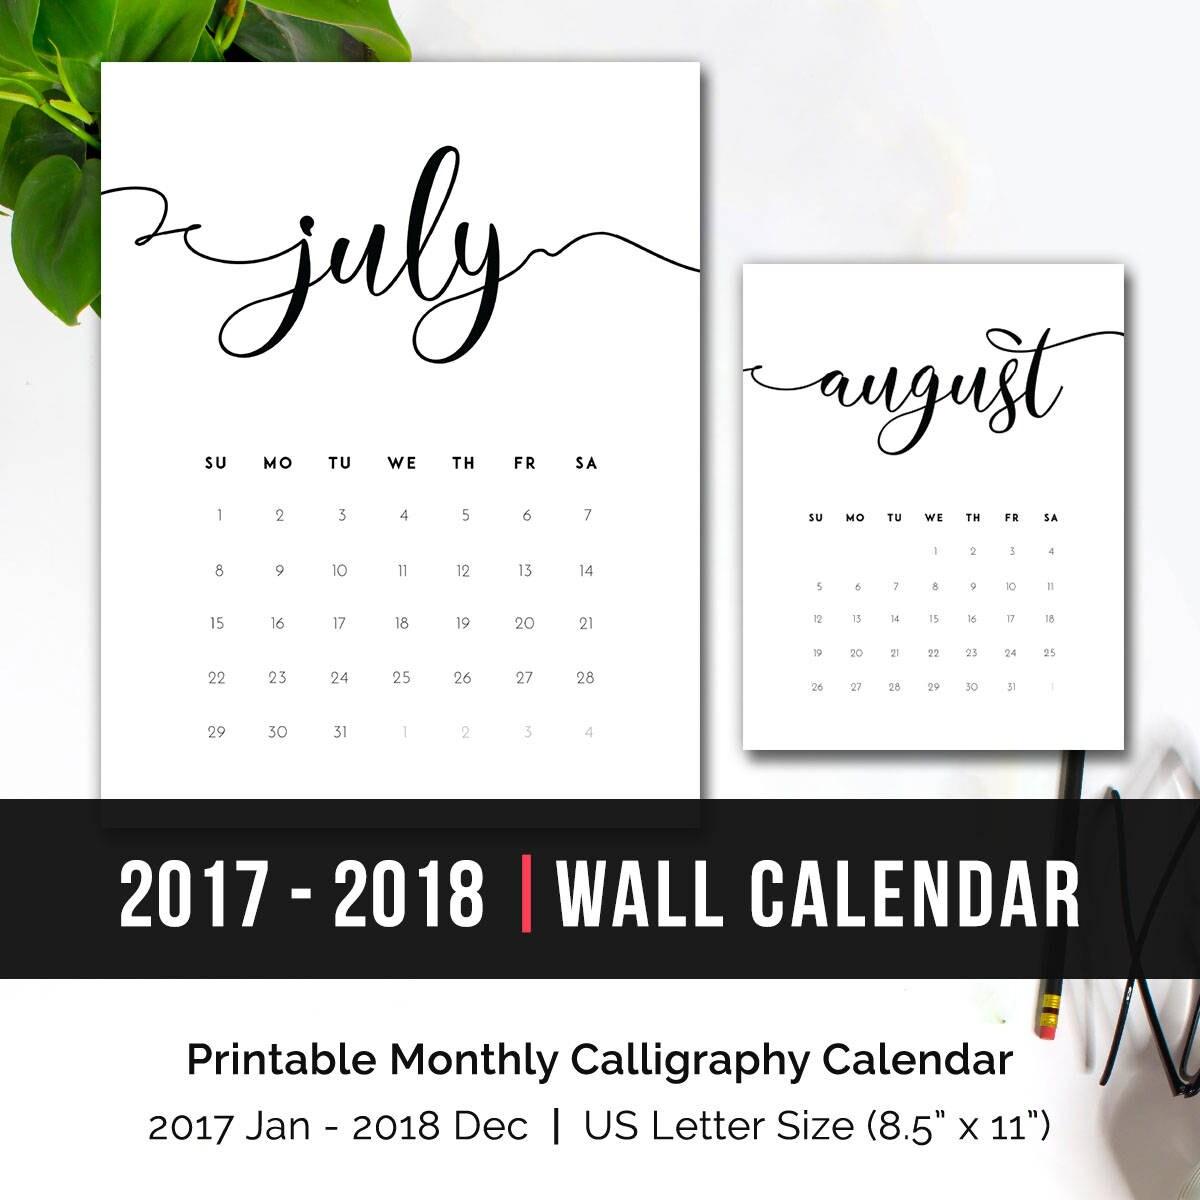 Printable Monthly Calendars 2018: Printable Calendar 2018 Monthly Wall Calendar 2018 Monthly